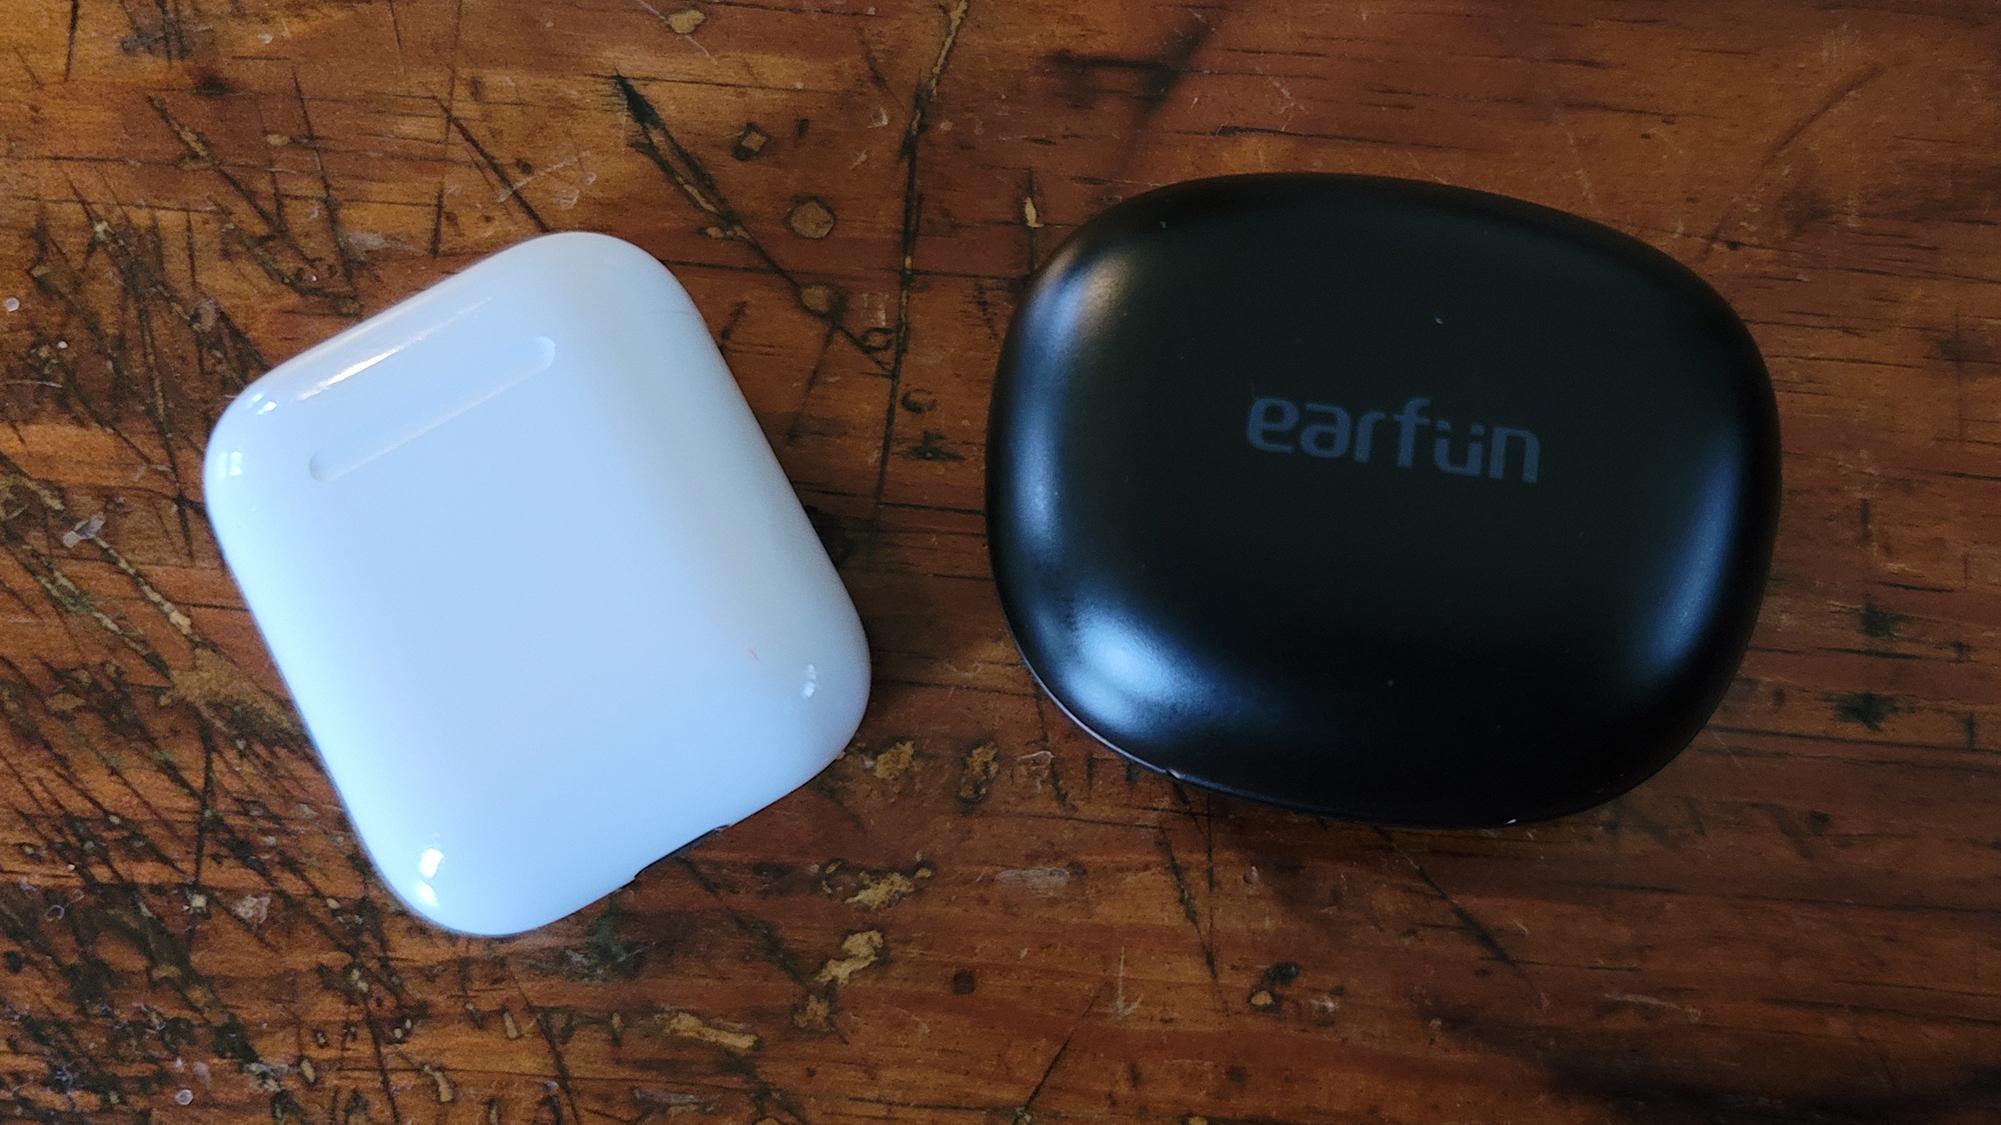 Earfun Air Pro true wireless earbuds case next to Airpods case